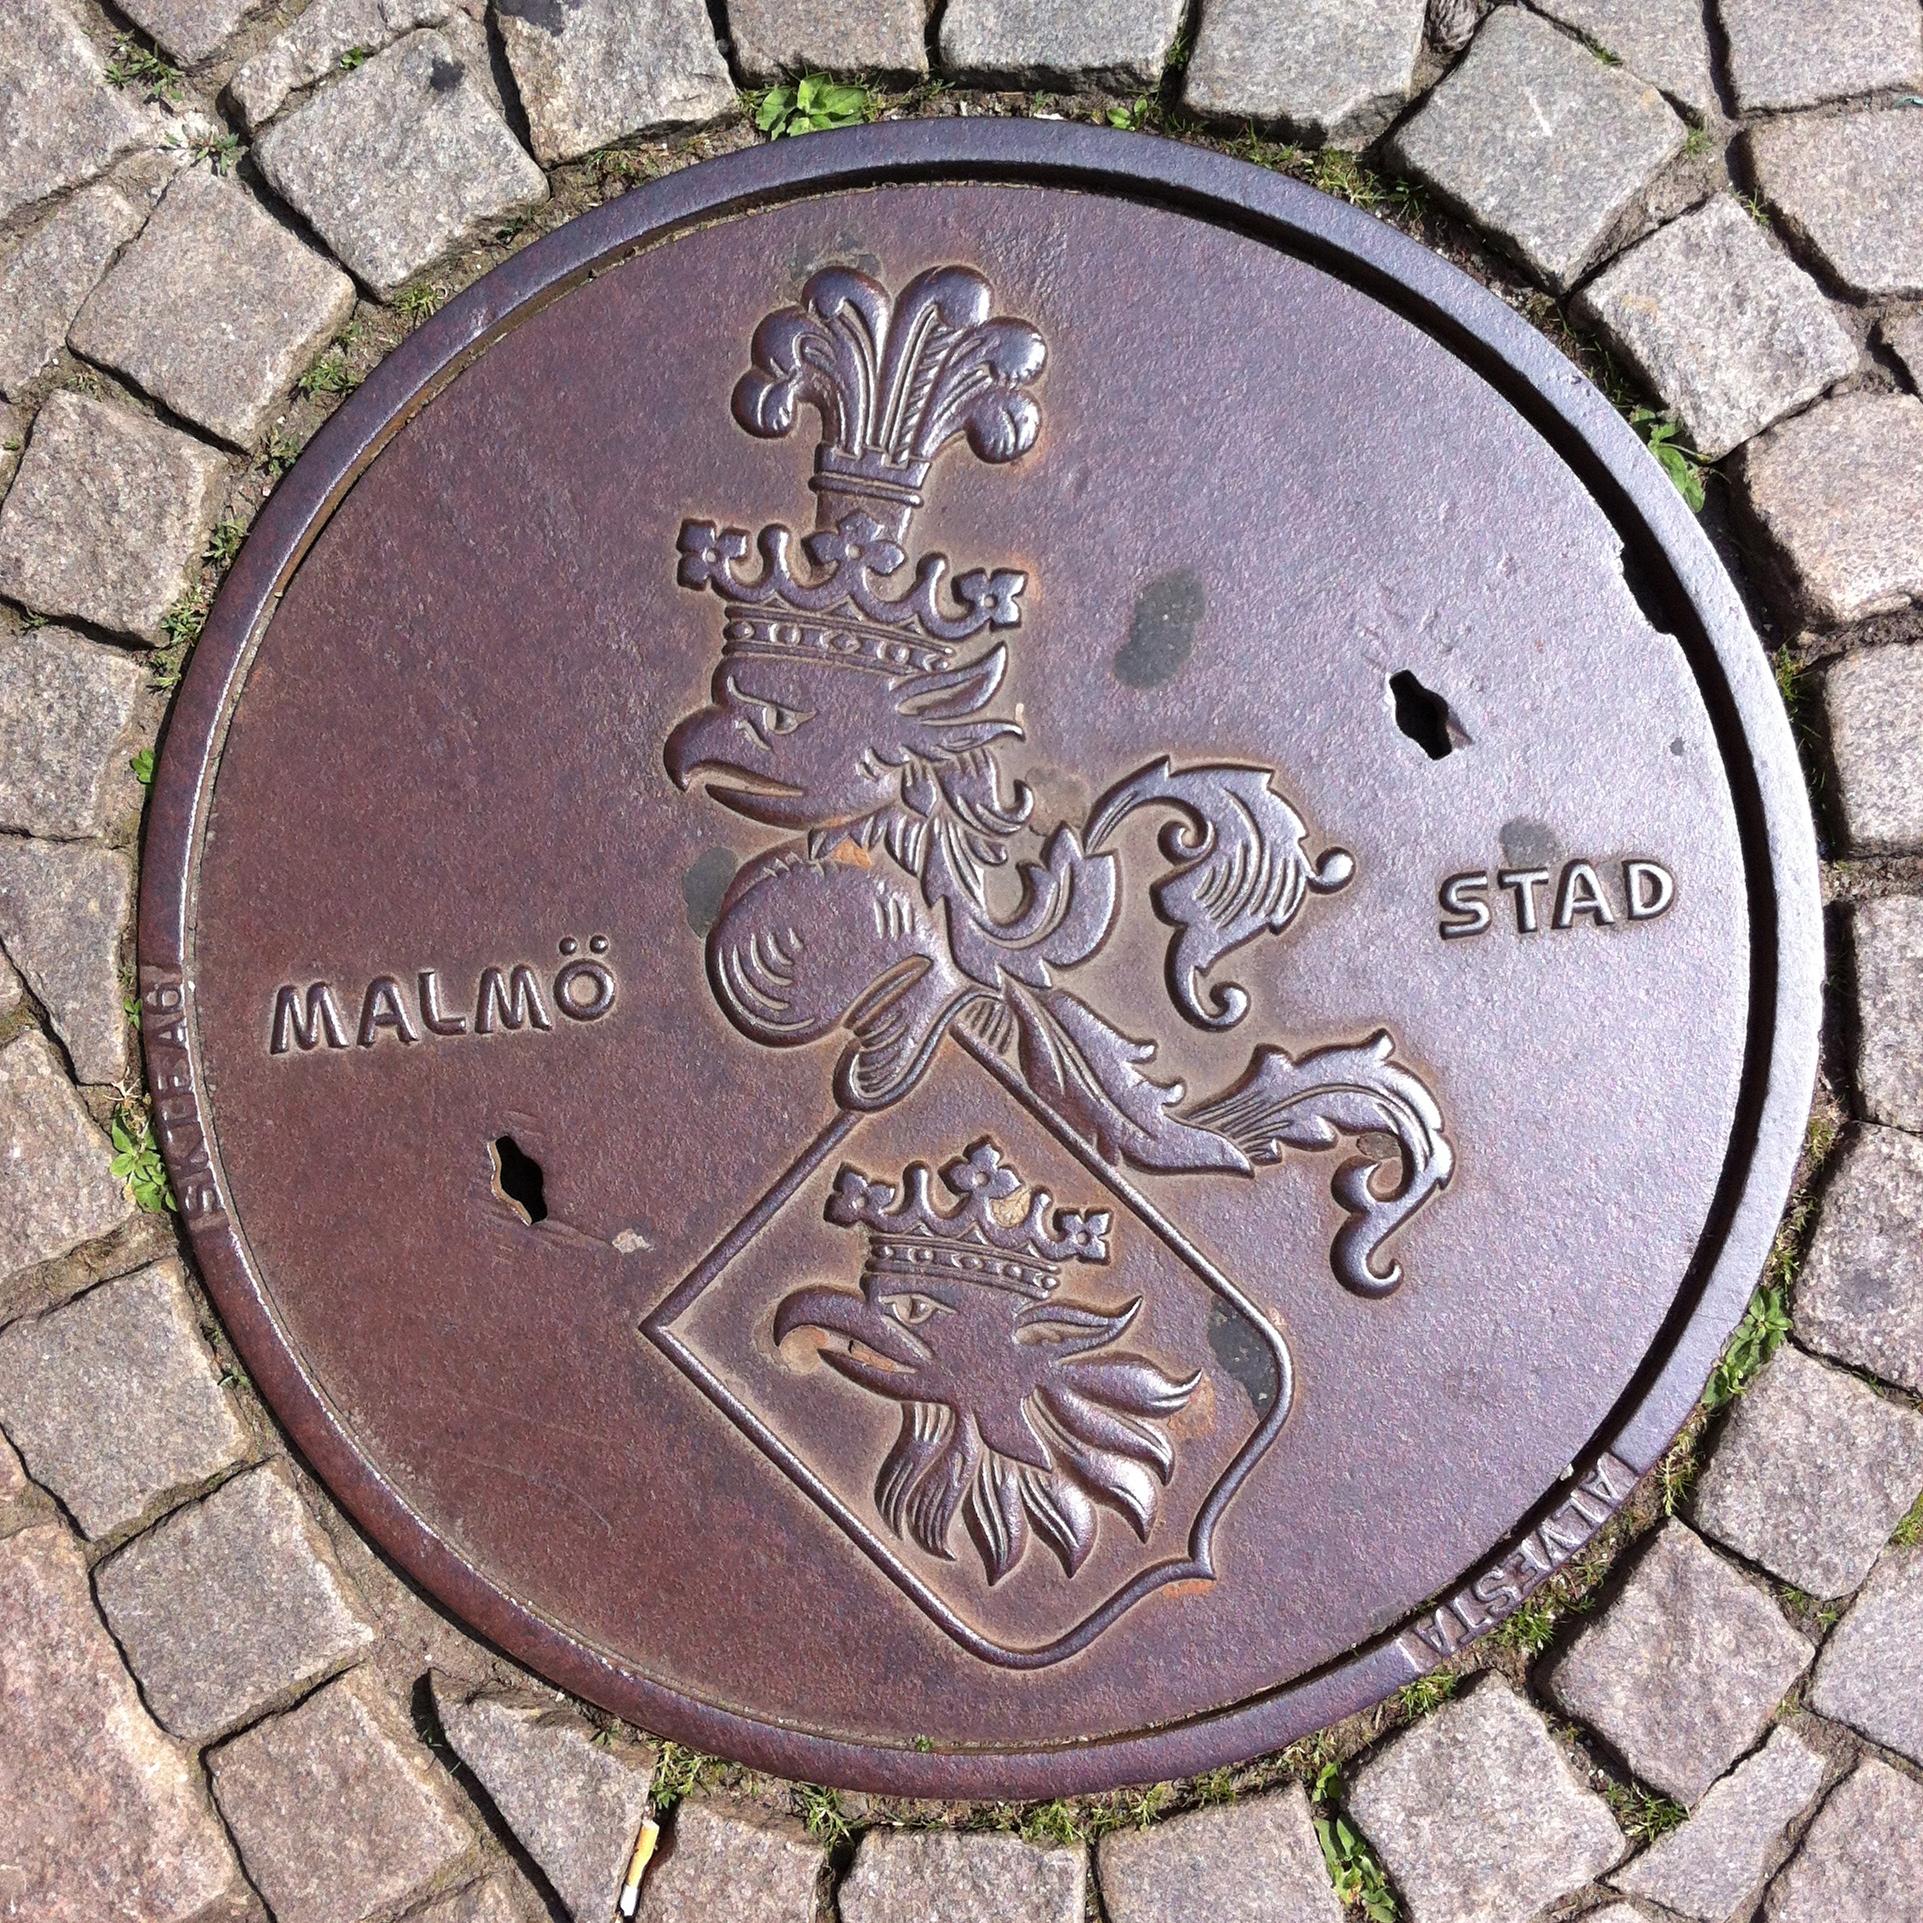 Malmo manhole